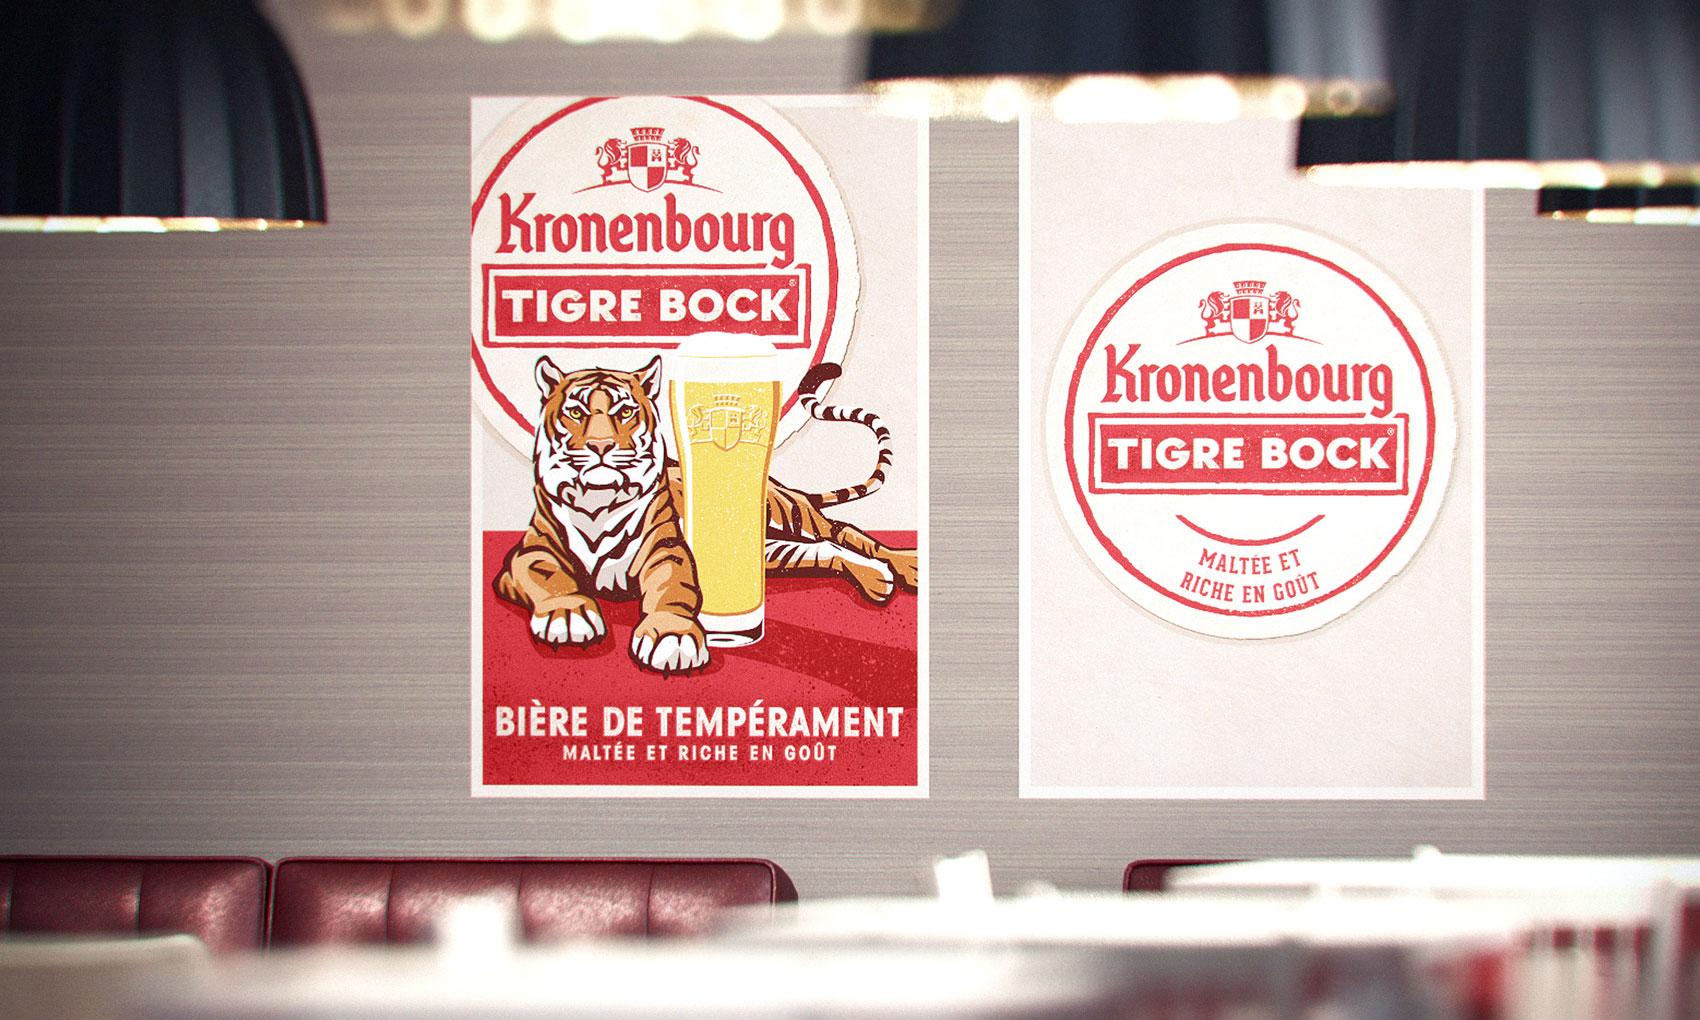 kronenbourg-tigre-bock-4